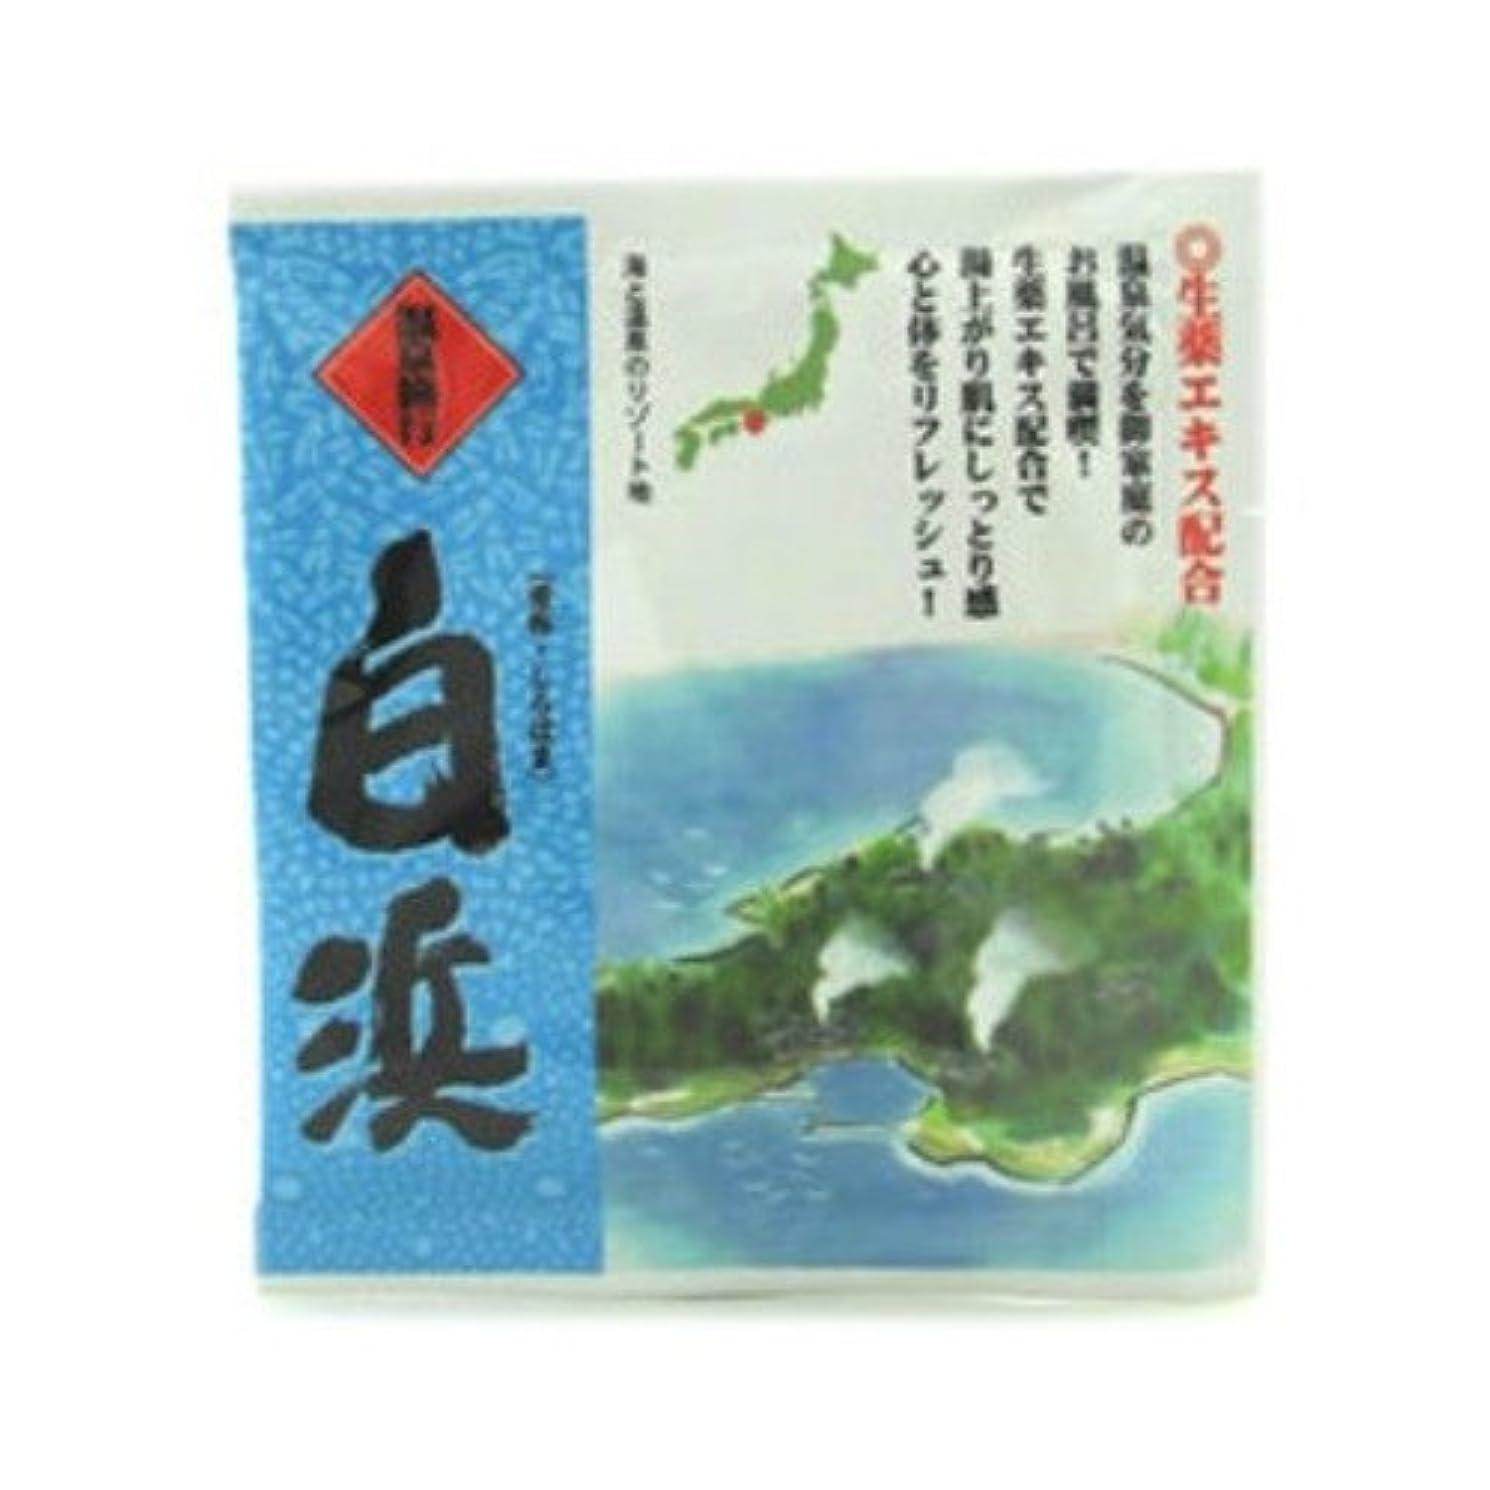 発行雑種フォロー五洲薬品 温泉旅行 白浜 25g 4987332128205